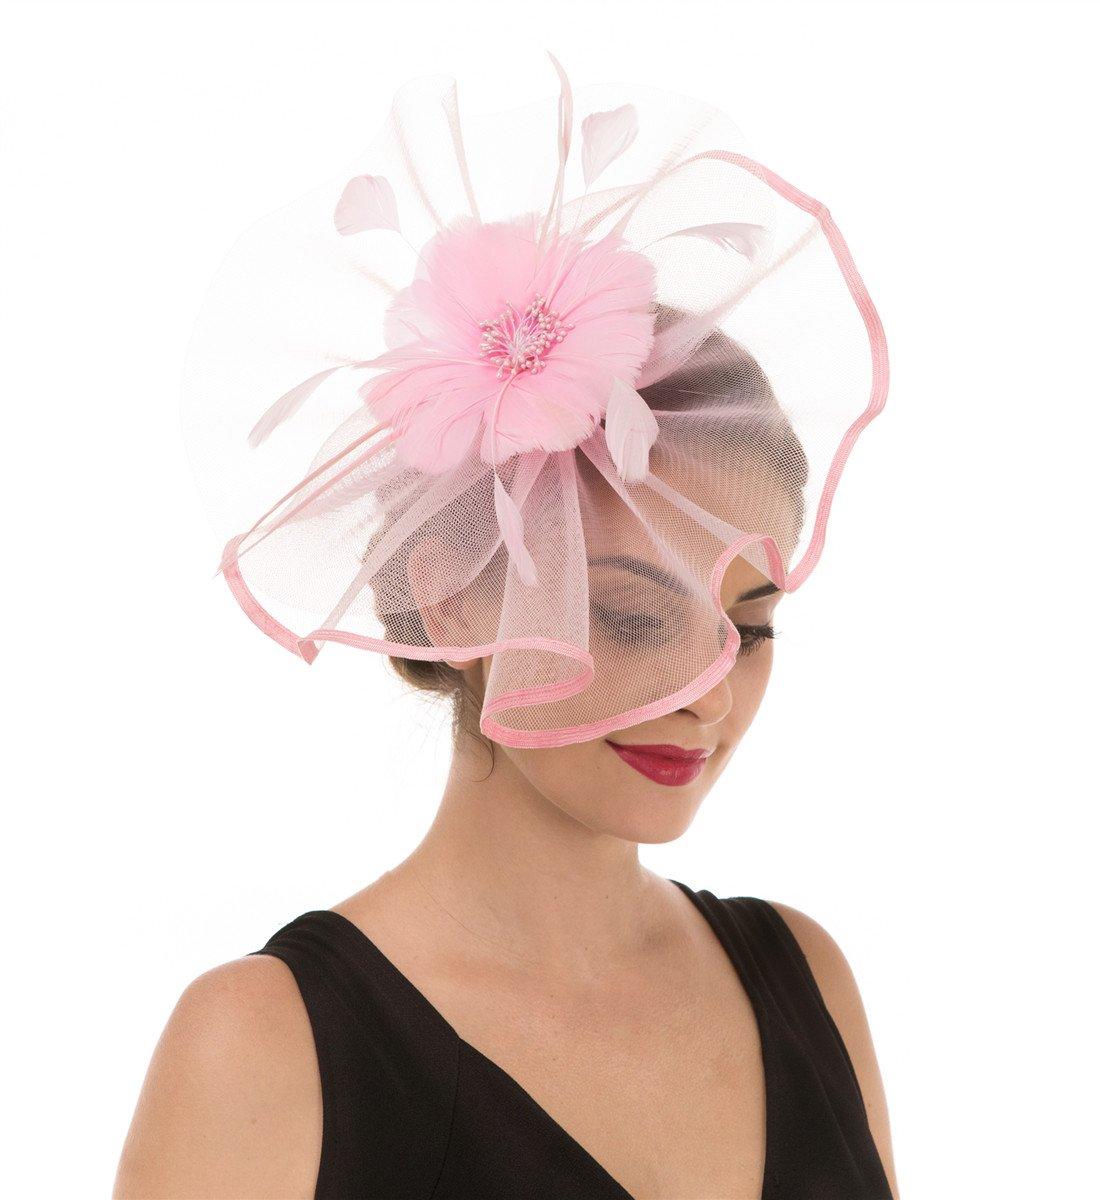 944b3470048 SAFERIN Pink Fascinator Hat Feather Mesh Net Veil Wedding Party Hat Flower Kentucky  Derby Hat Clip Hairband Women (TA1-Pink) - unknown   Hats   Caps ...